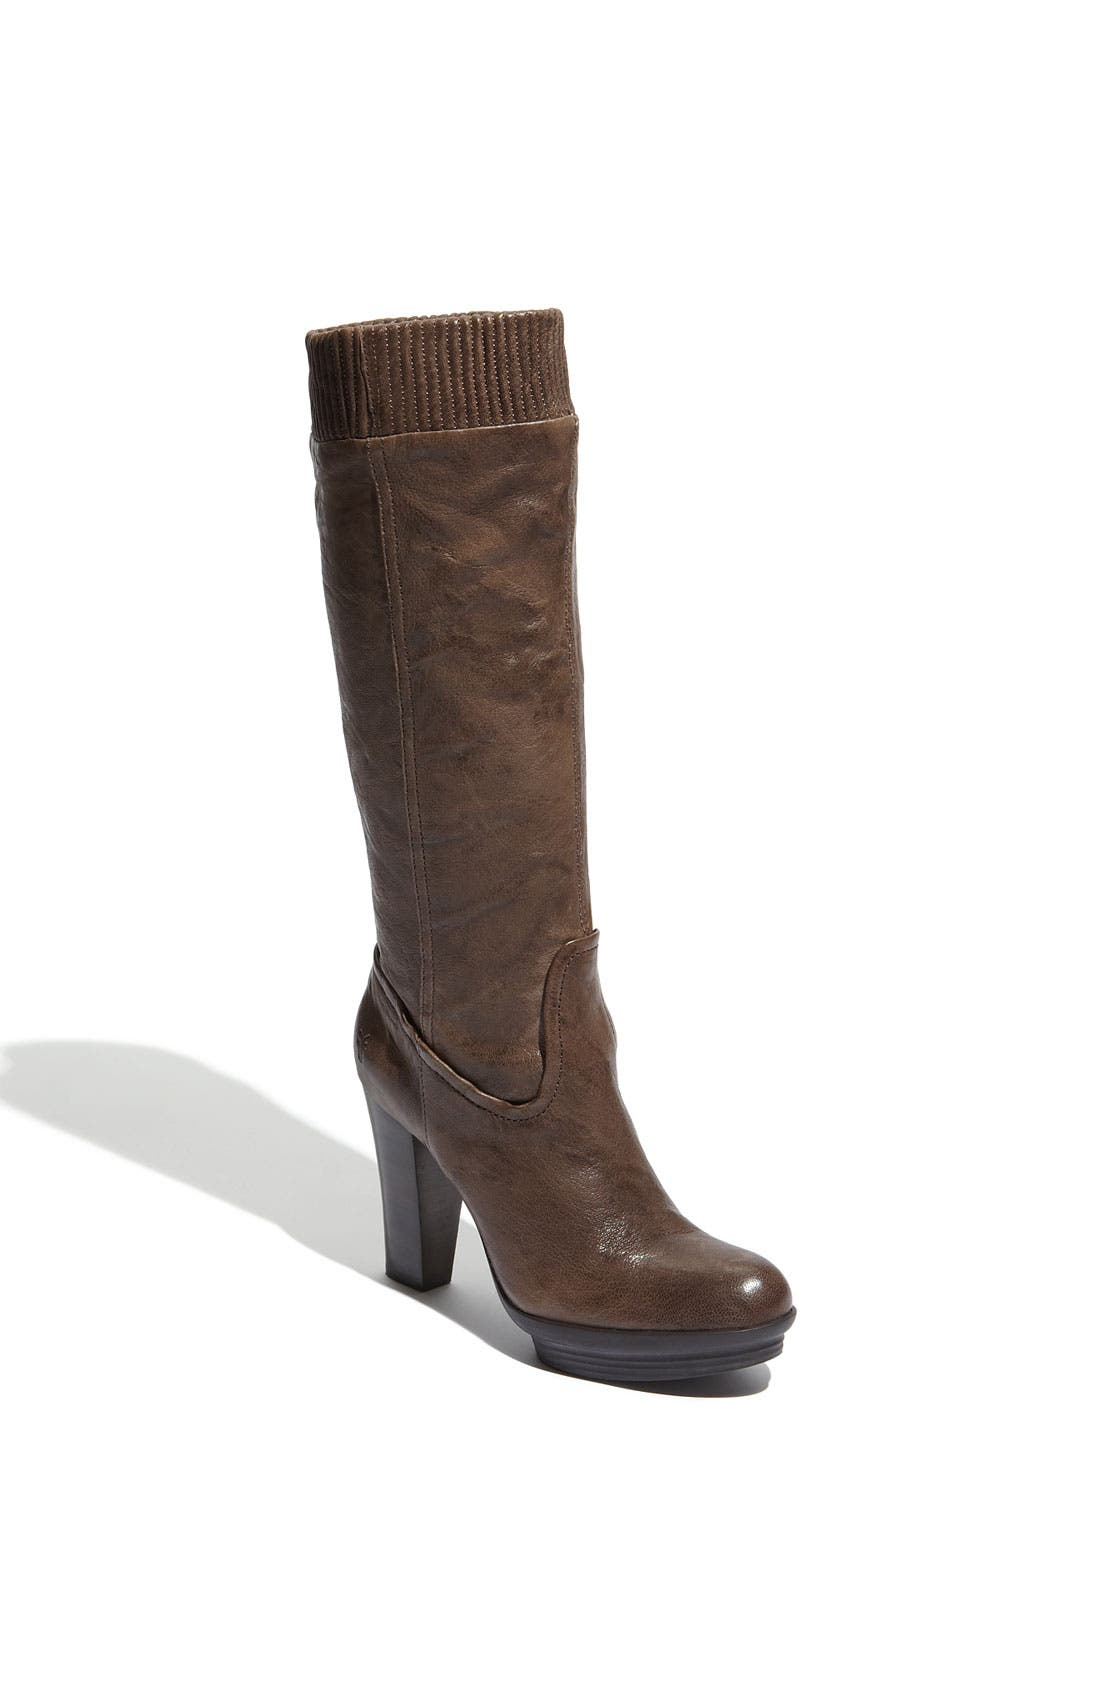 Main Image - Frye 'Mimi' Boot